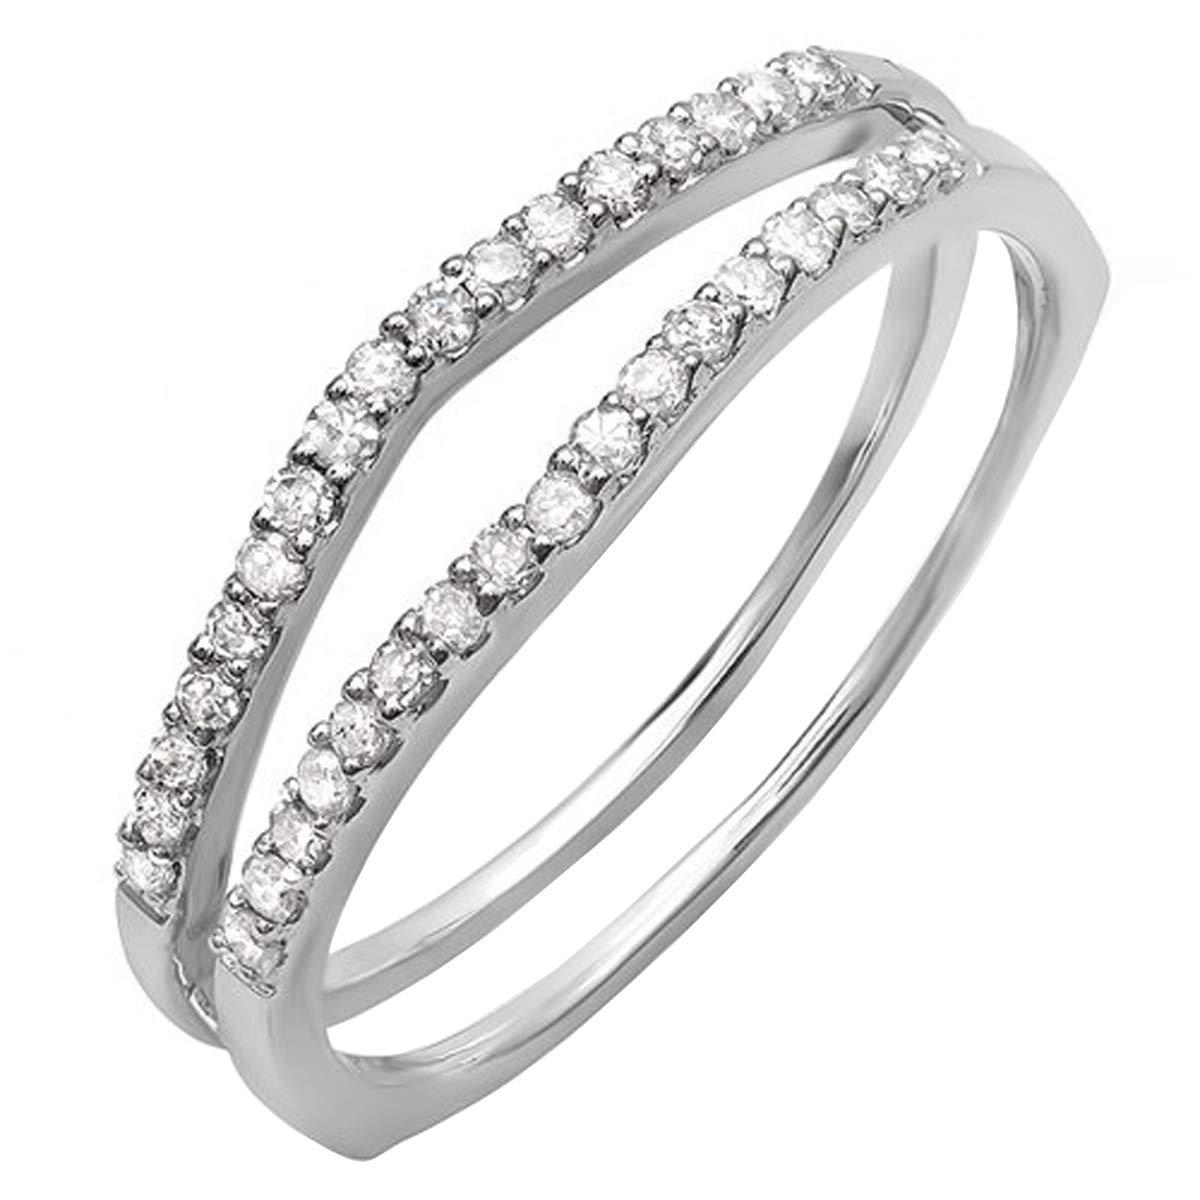 Dazzlingrock Collection AGS Certified 0.25 Carat (ctw) 10K White Diamond Enhancer Guard Wedding Band 1/4 CT, White Gold, Size 7 by Dazzlingrock Collection